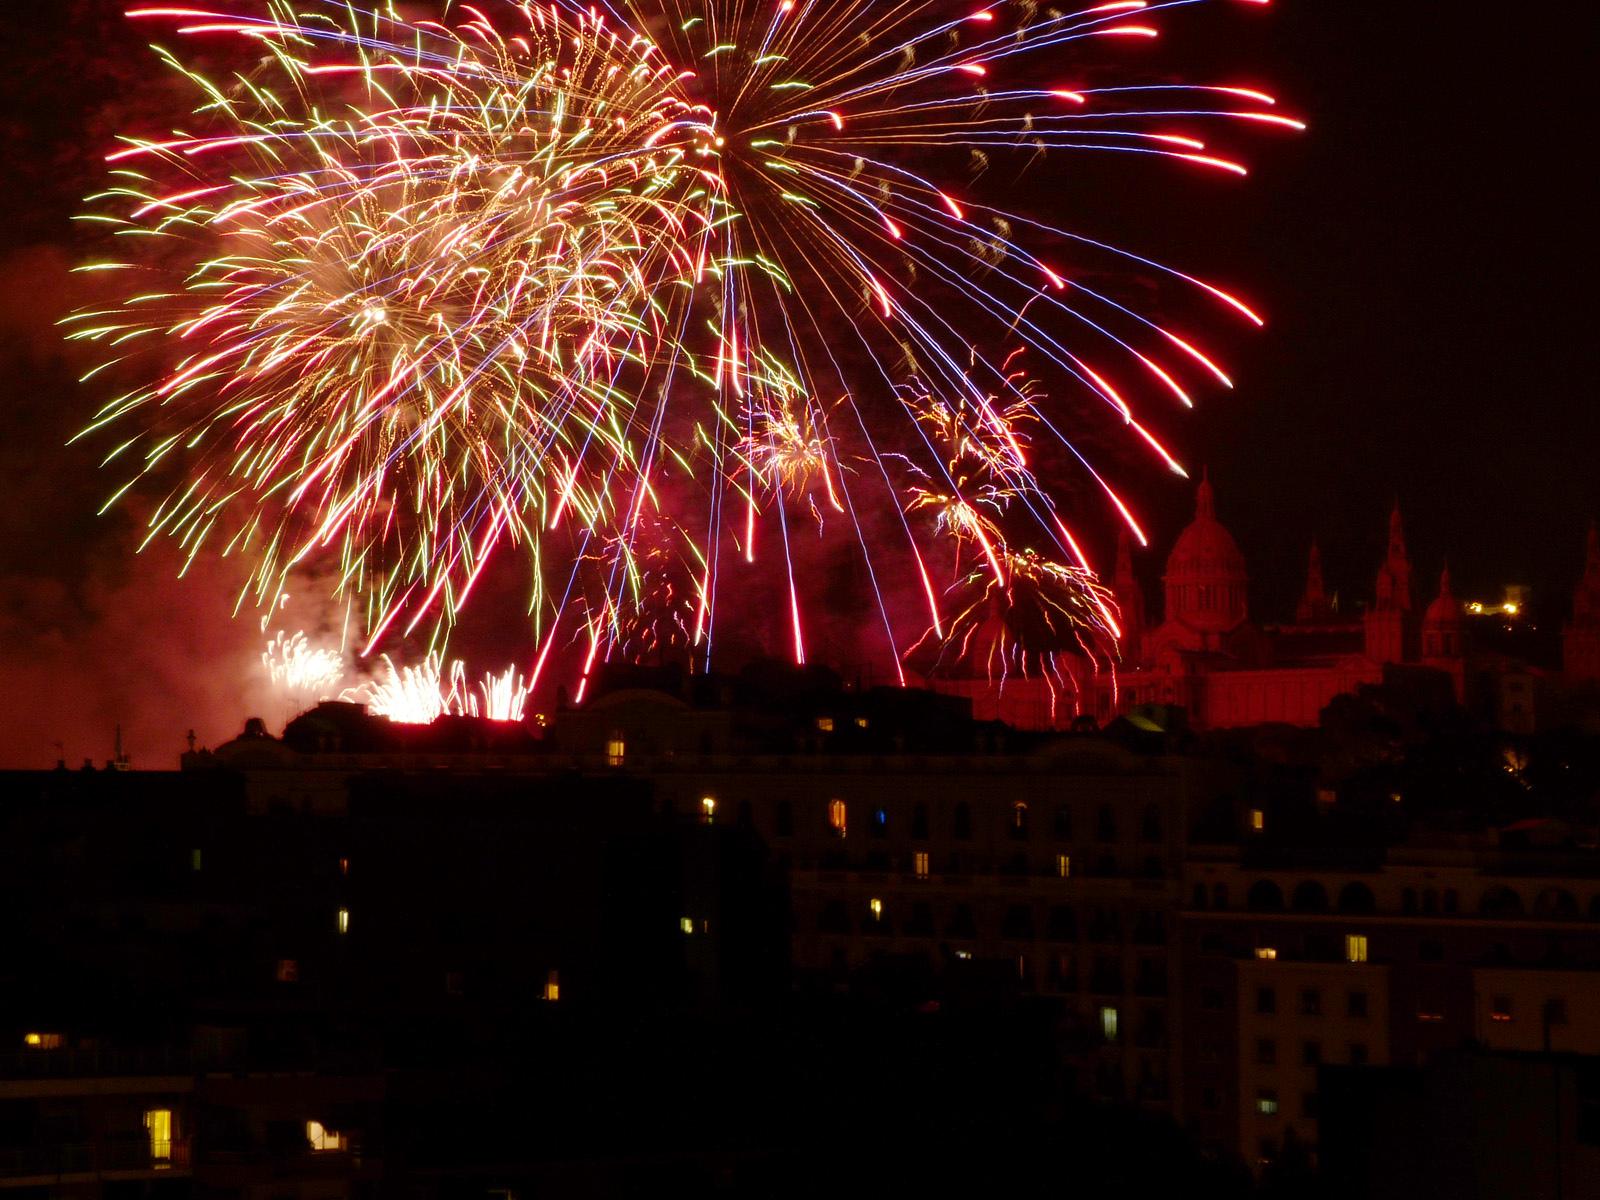 The La Mercè firework display © PROMiquel Angel Pintanel Bassets